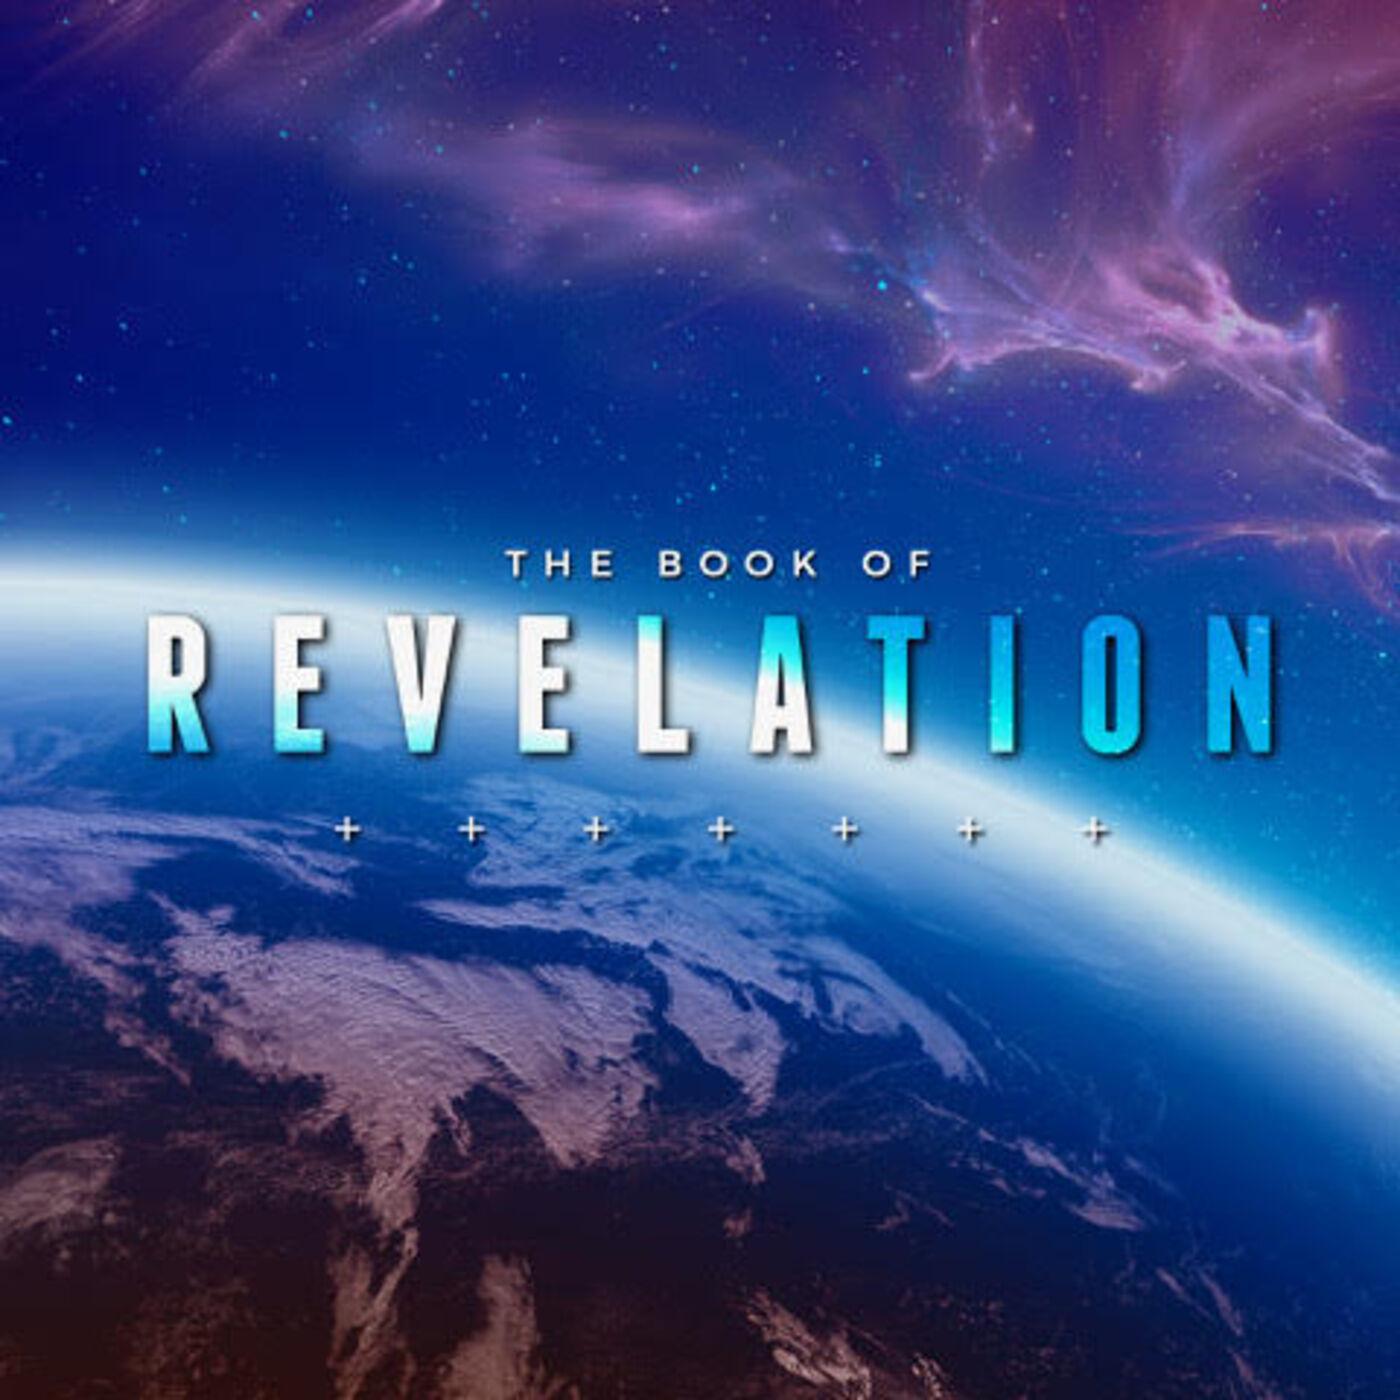 The Last Church (Laodicea) - Revelation 3:14-22 - Pastor Dan Plourde